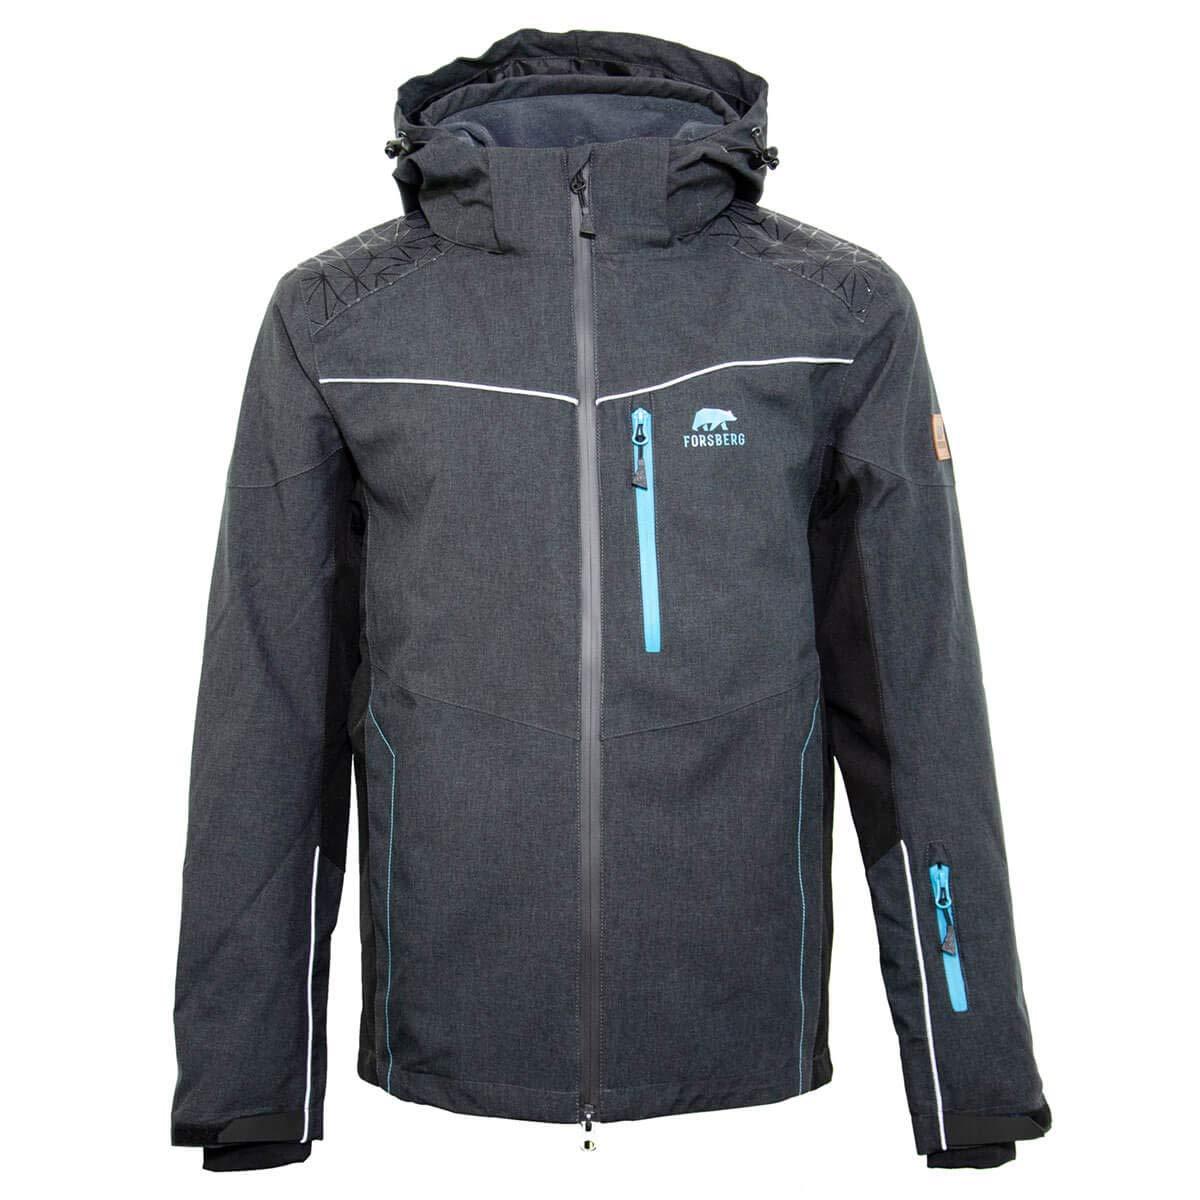 Funktionsjacke hochwertig Herren langlebig Winddicht wasserdichte Jacke FORSBERG Wetterschutzjacke atmungsaktiv Skinn ZipIn für 3L5AR4j